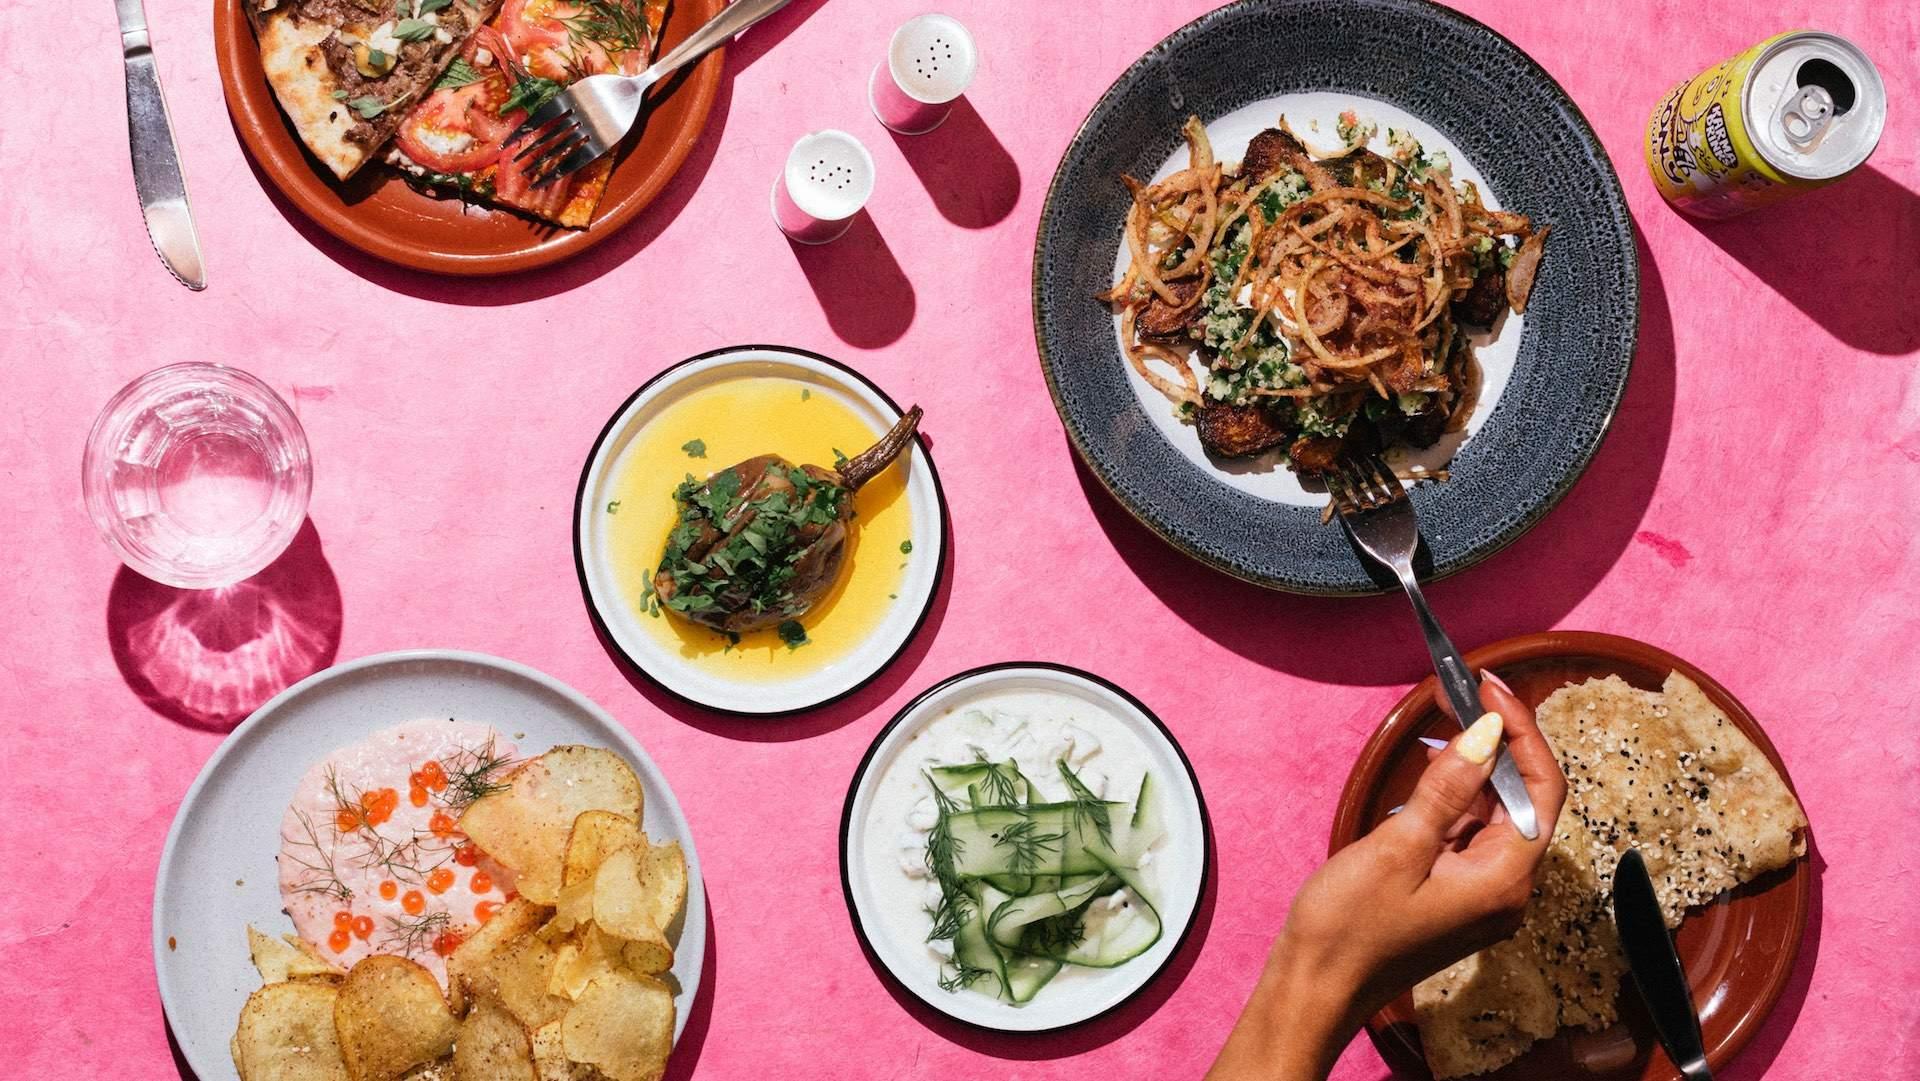 Kisa Is a New Wellington Pop-Up Serving Middle Eastern Cuisine